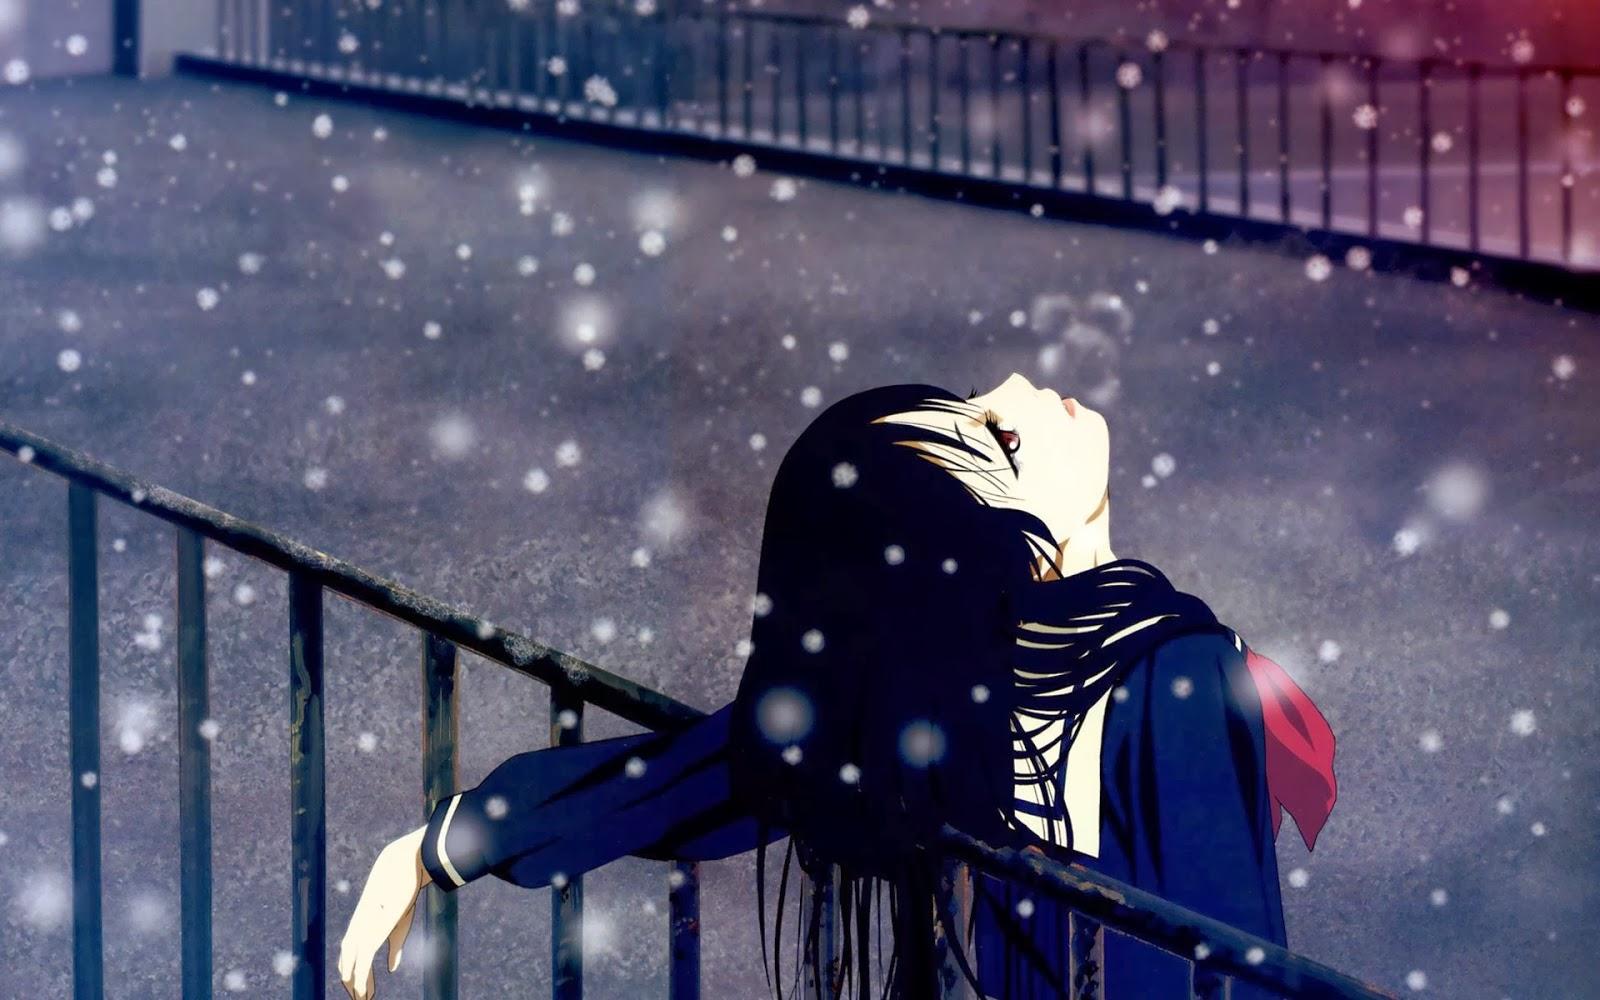 girl anime photo collection 2014 2015 for facebook very sad mood anime 1600x1000